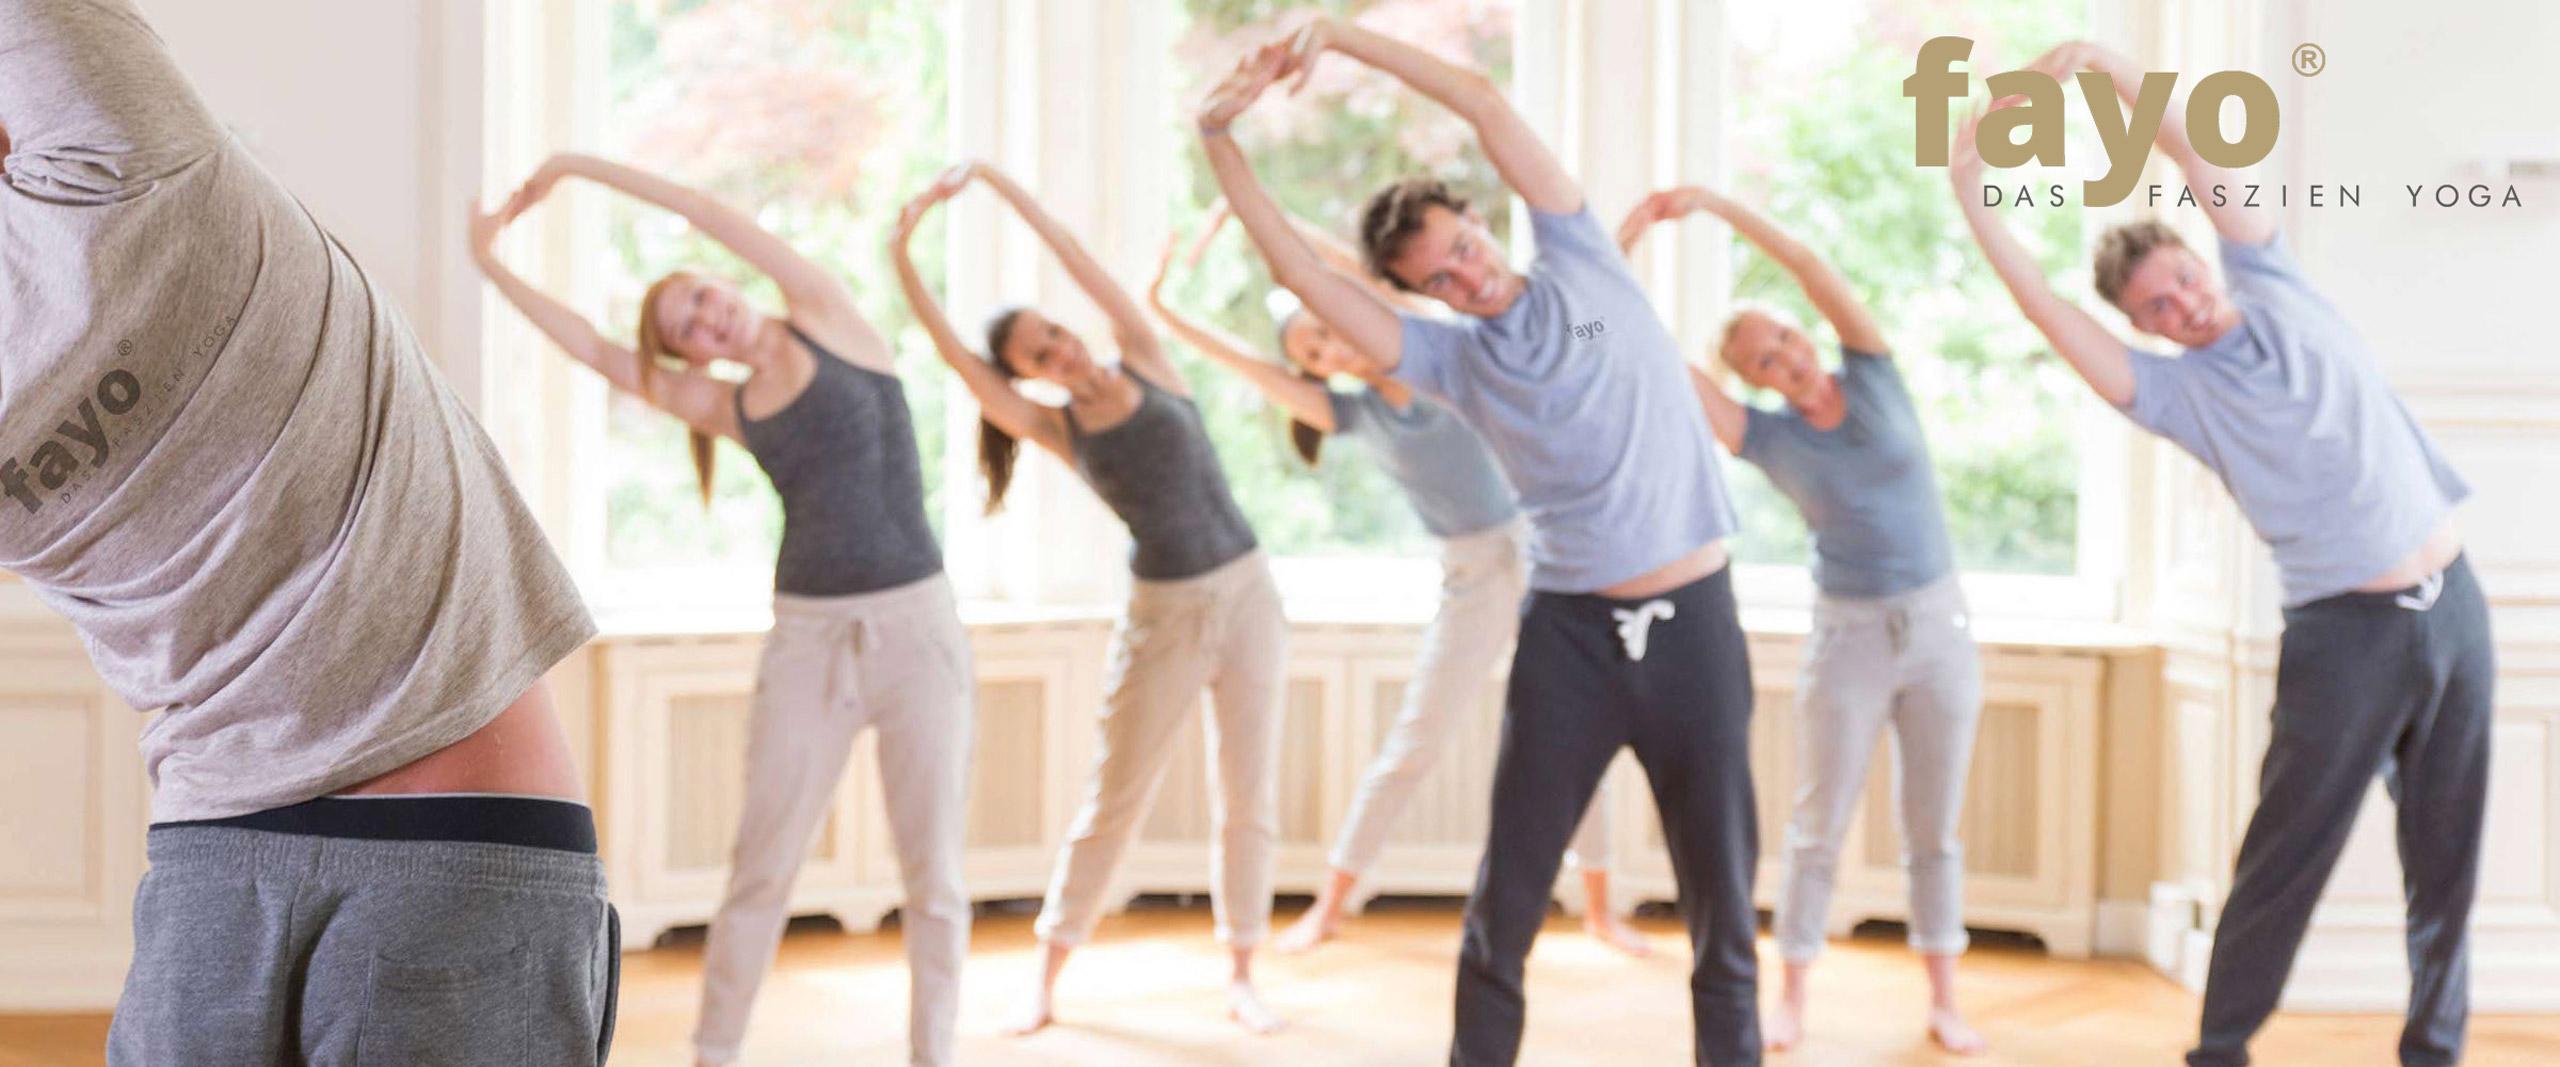 FaYo - Das Faszien Yoga